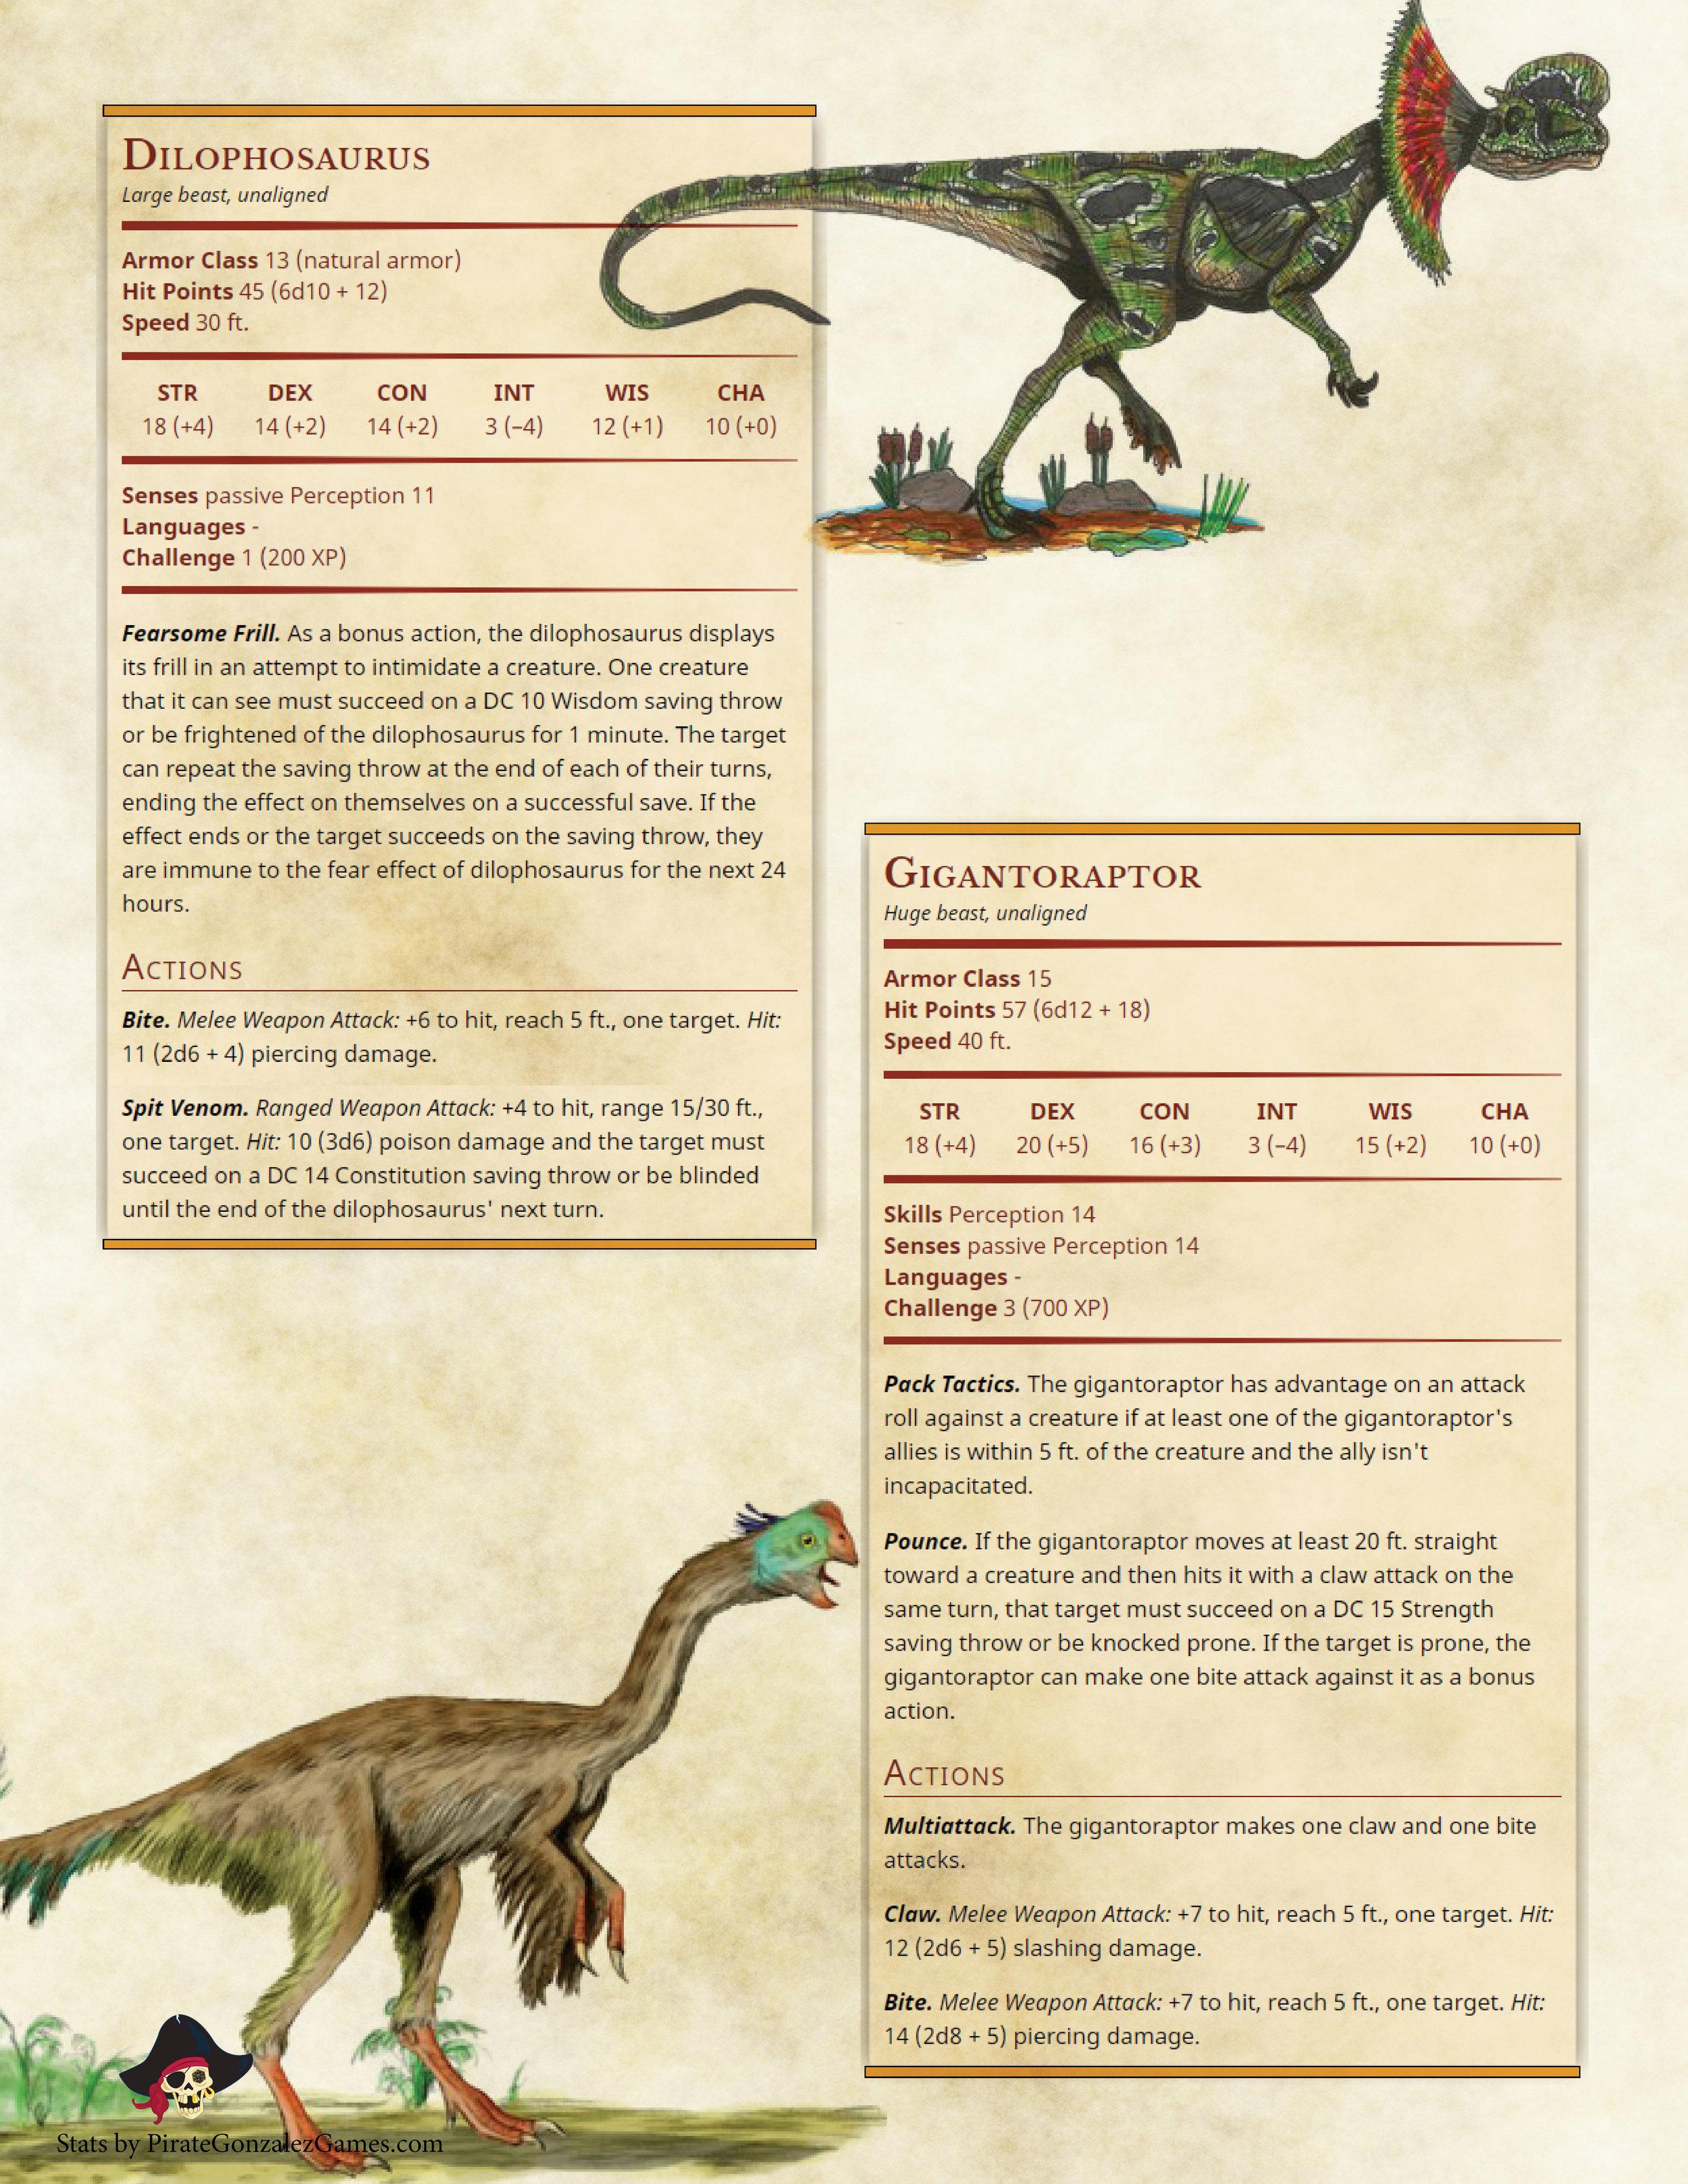 Dilophosaurus, Gigantoraptor